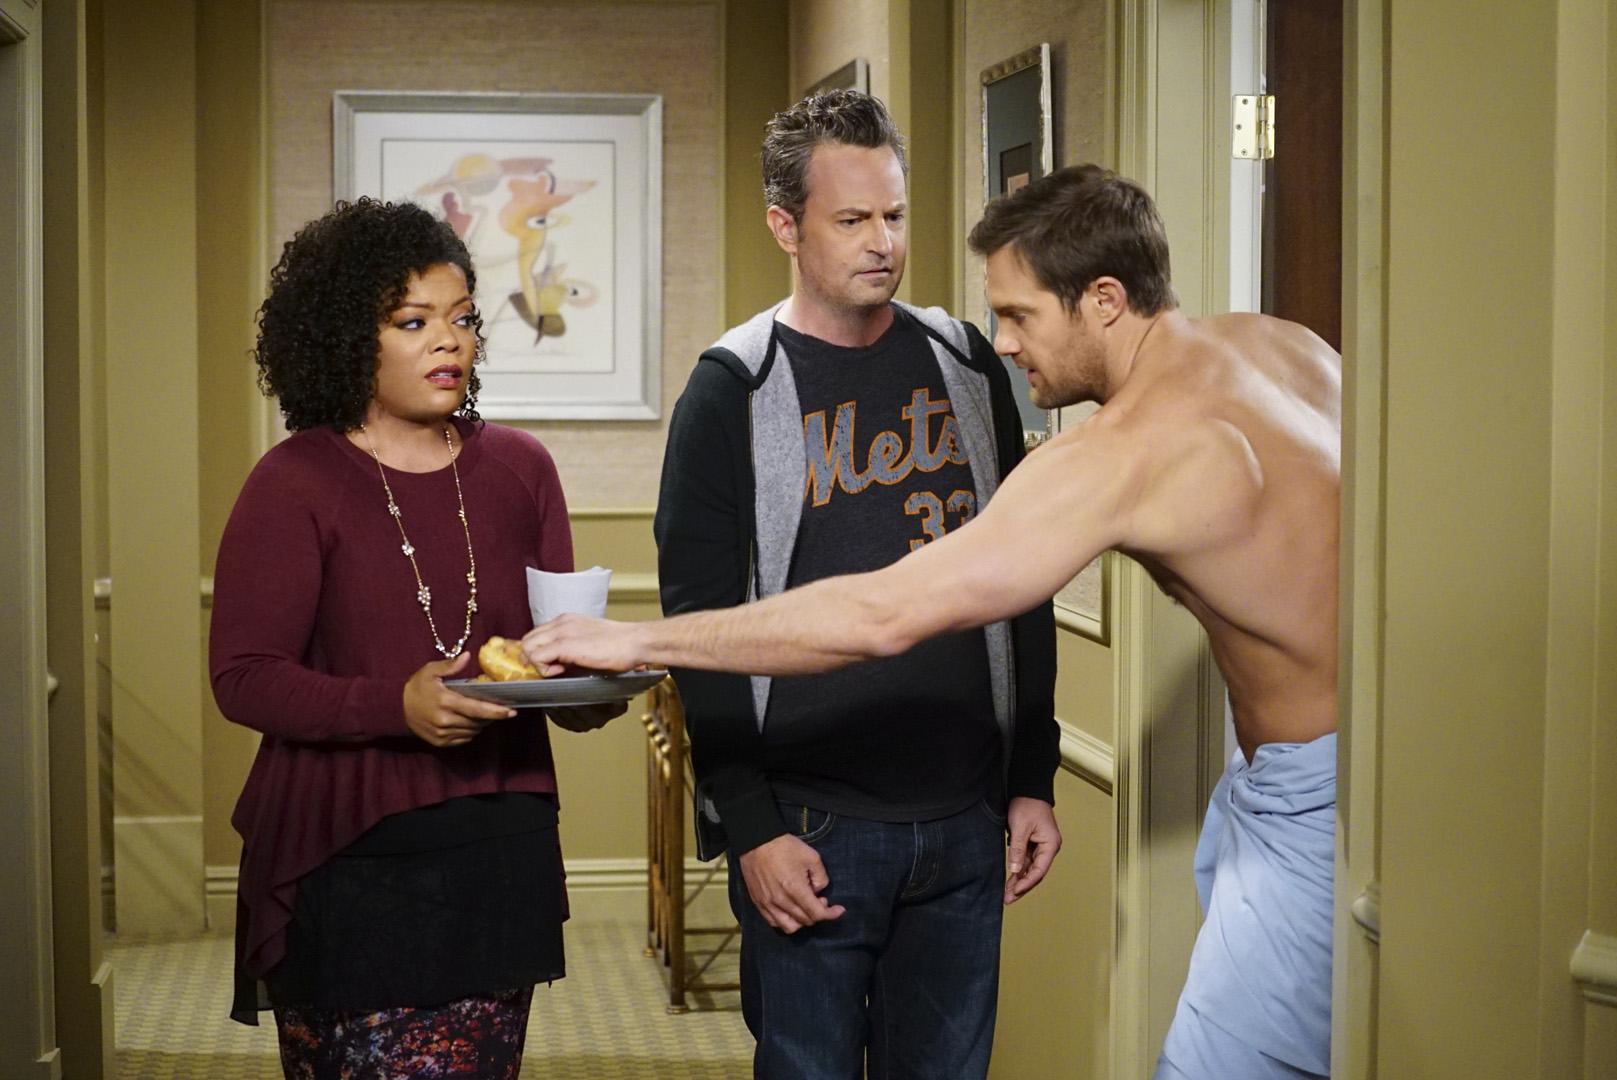 Murph grabs a fresh donut off Dani's plate.